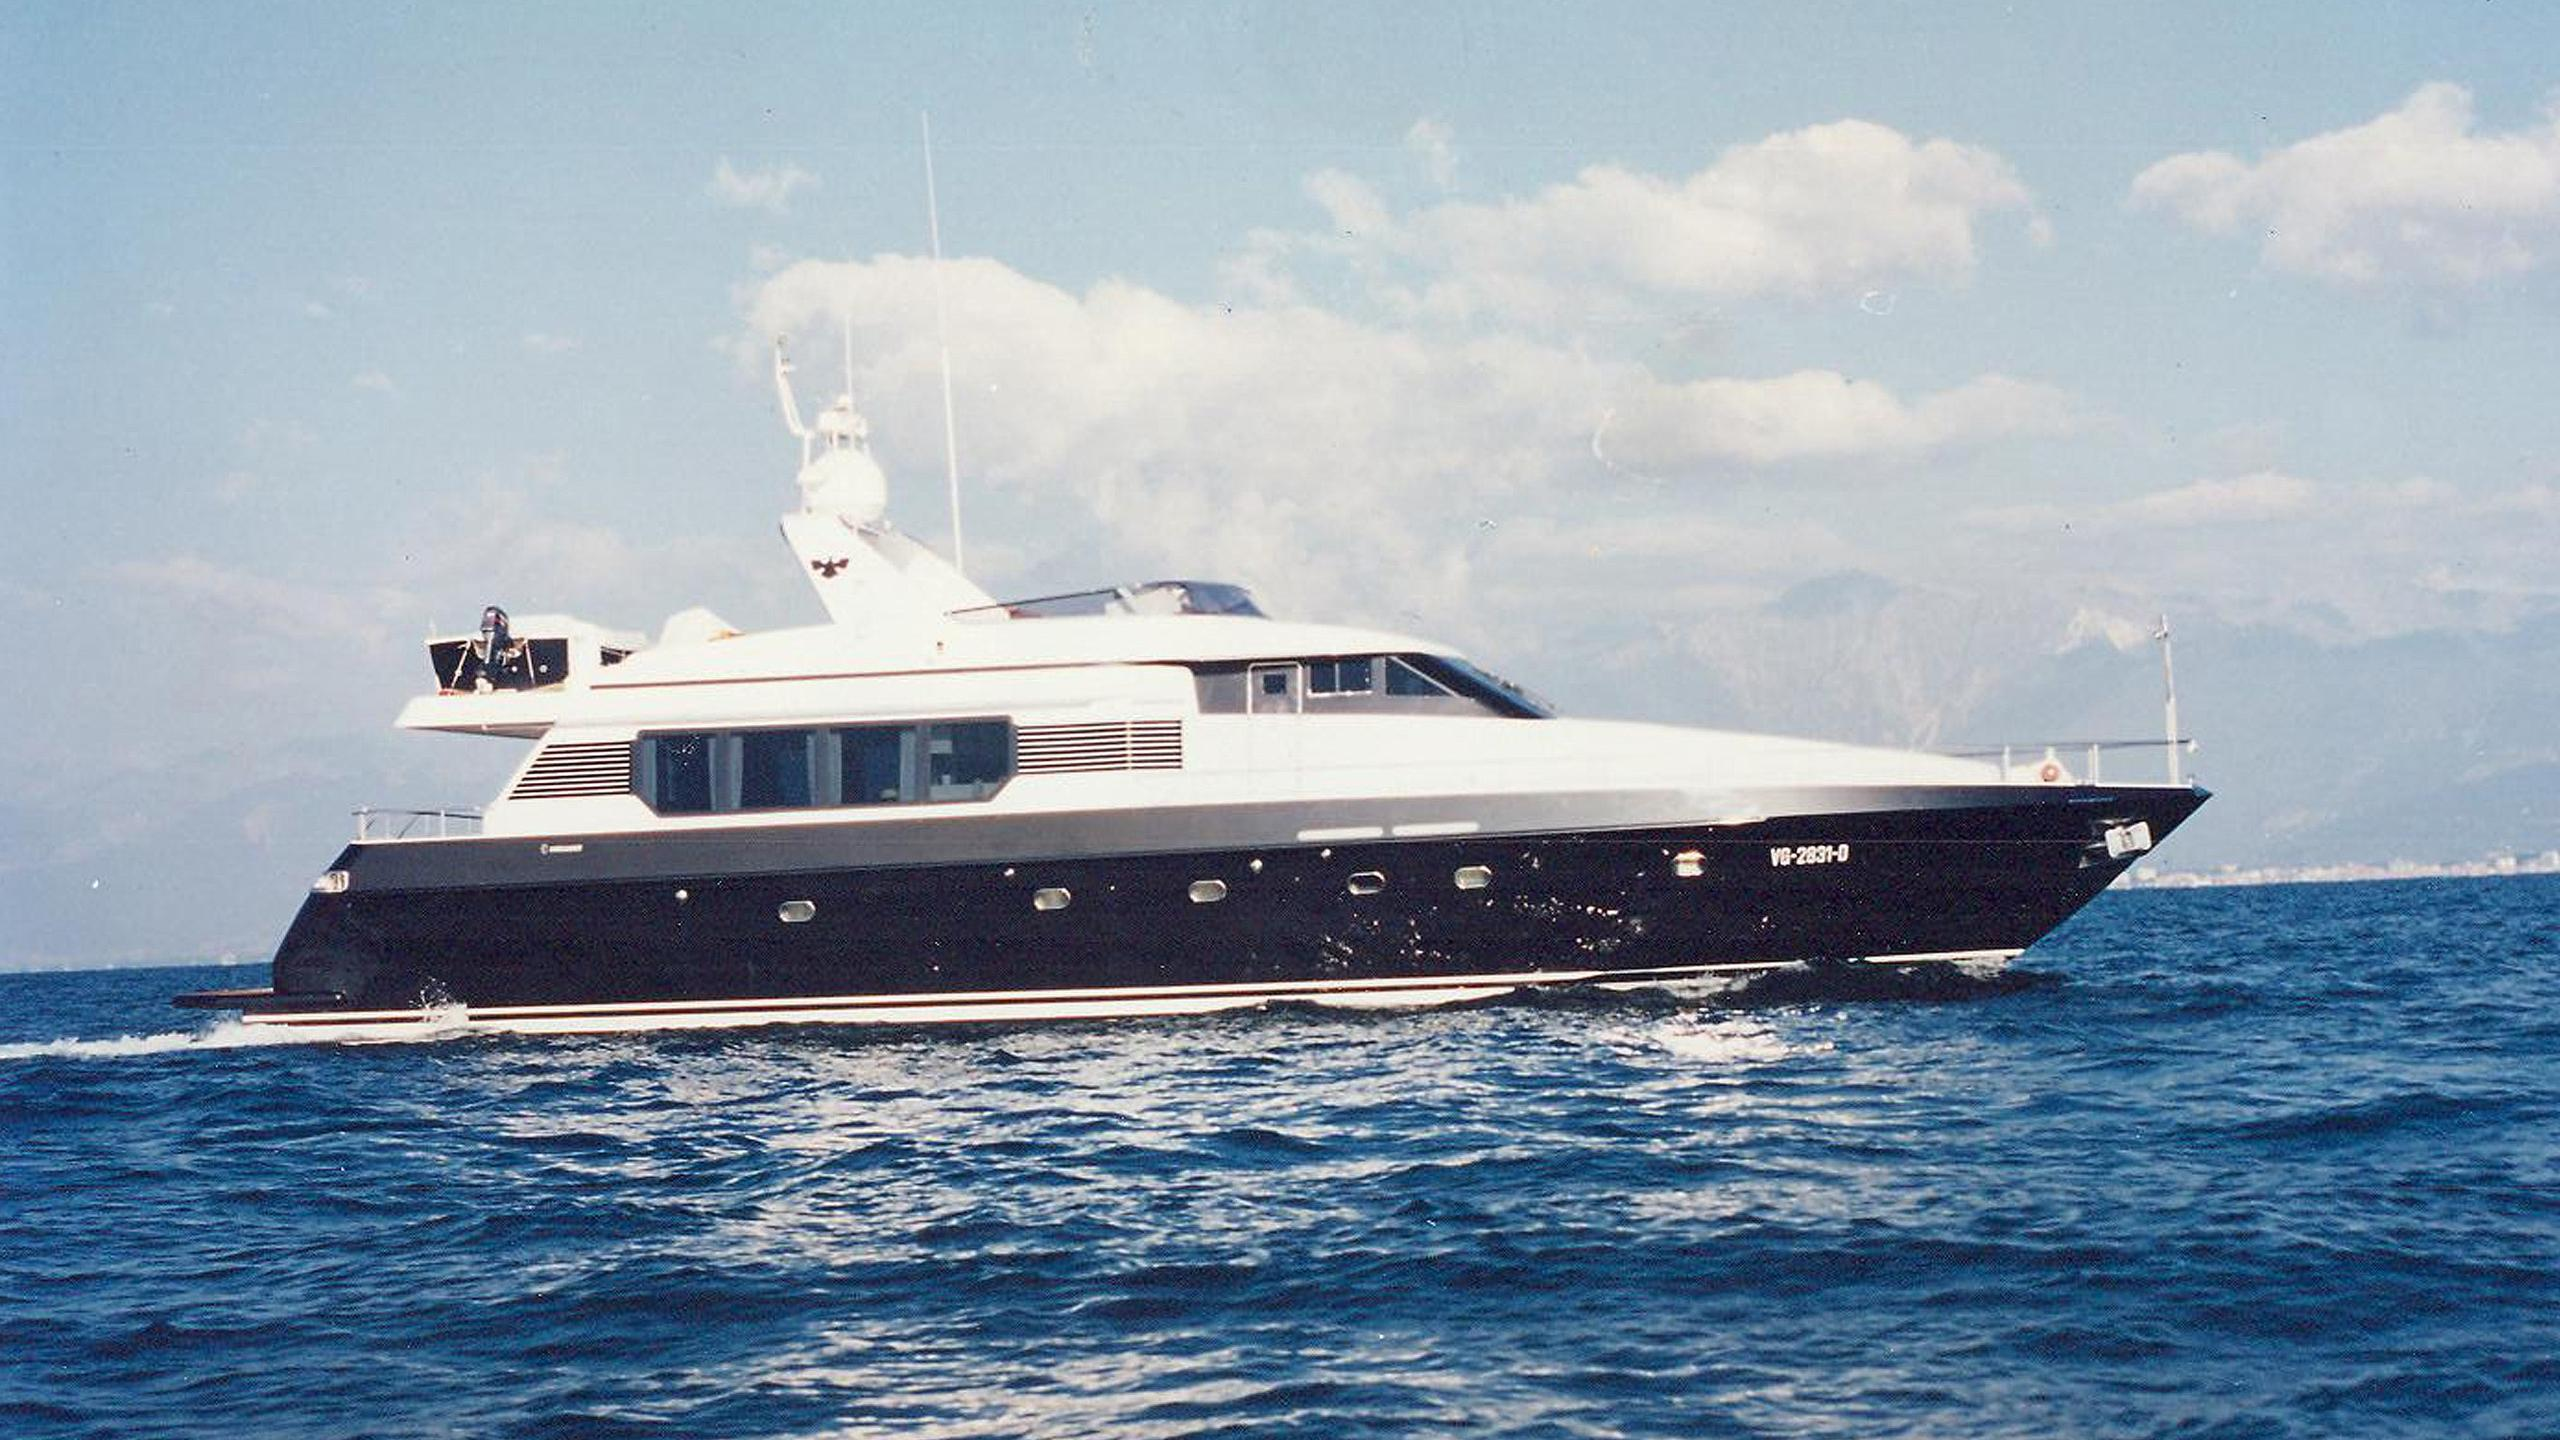 Visotta yacht profile